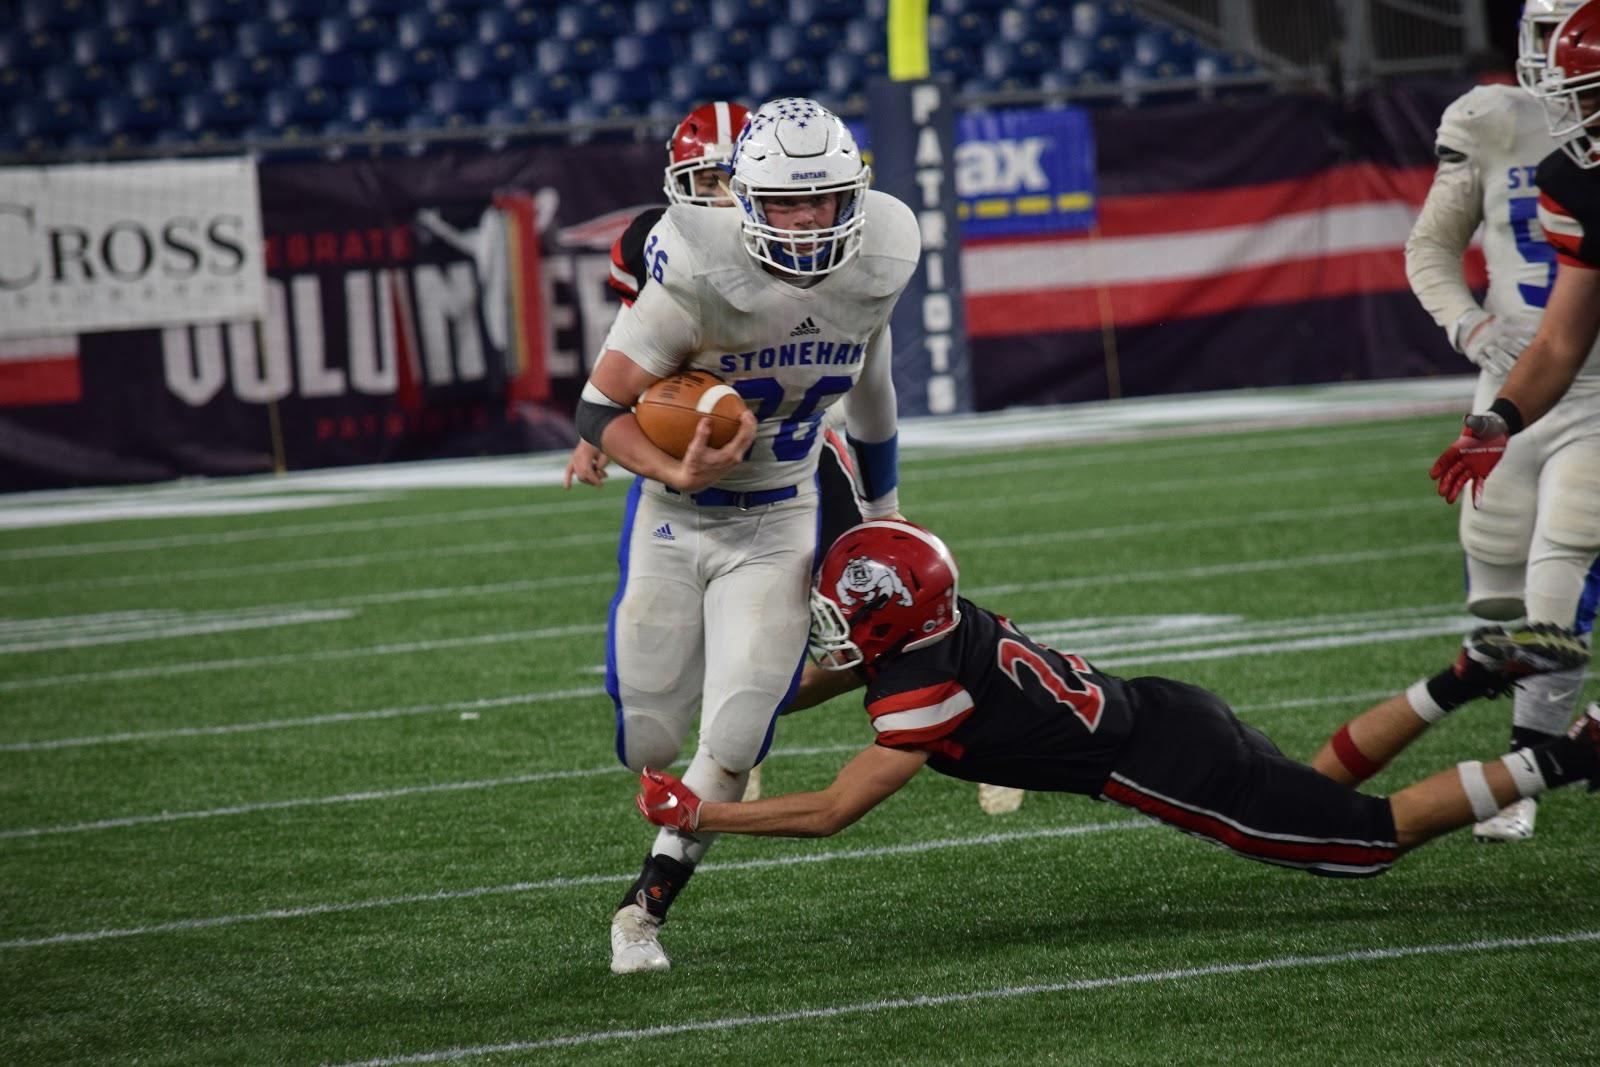 2018a High School Football All State Team